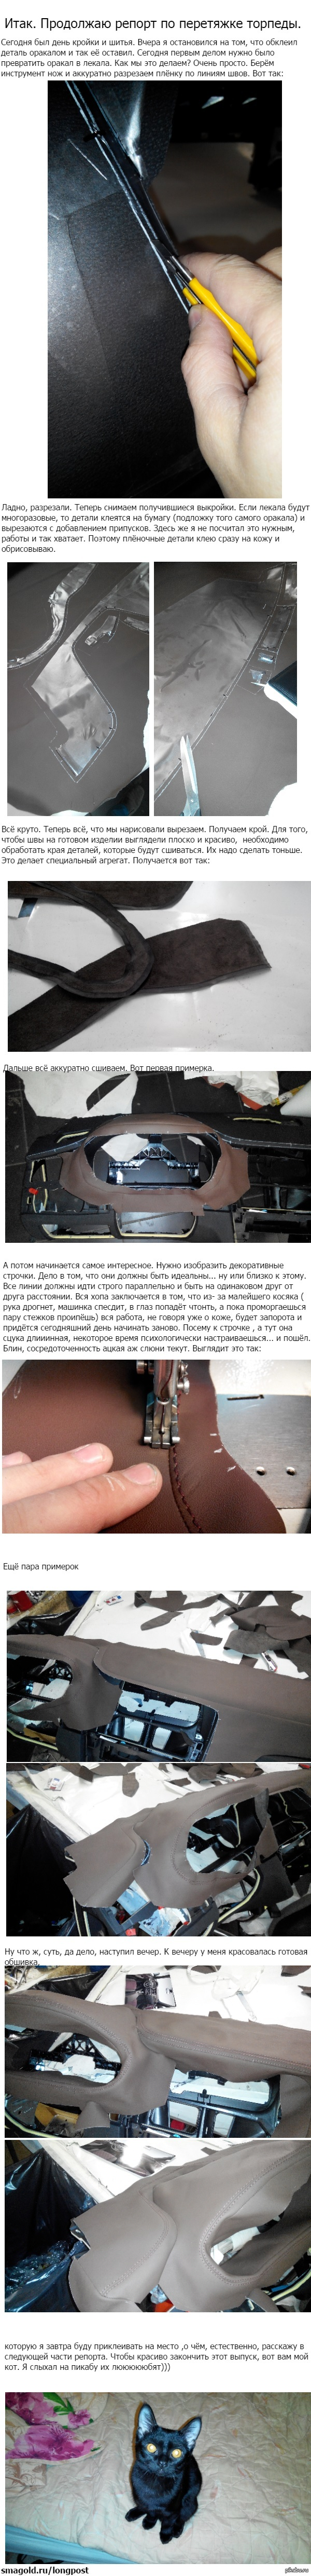 "Перетяжка торпедо BMW X3 Продолжение. Начало тут: <a href=""http://pikabu.ru/story/peretyazhka_kozhey_2885937"">http://pikabu.ru/story/_2885937</a>  Вчера не смог поместить, рейта не хватило."